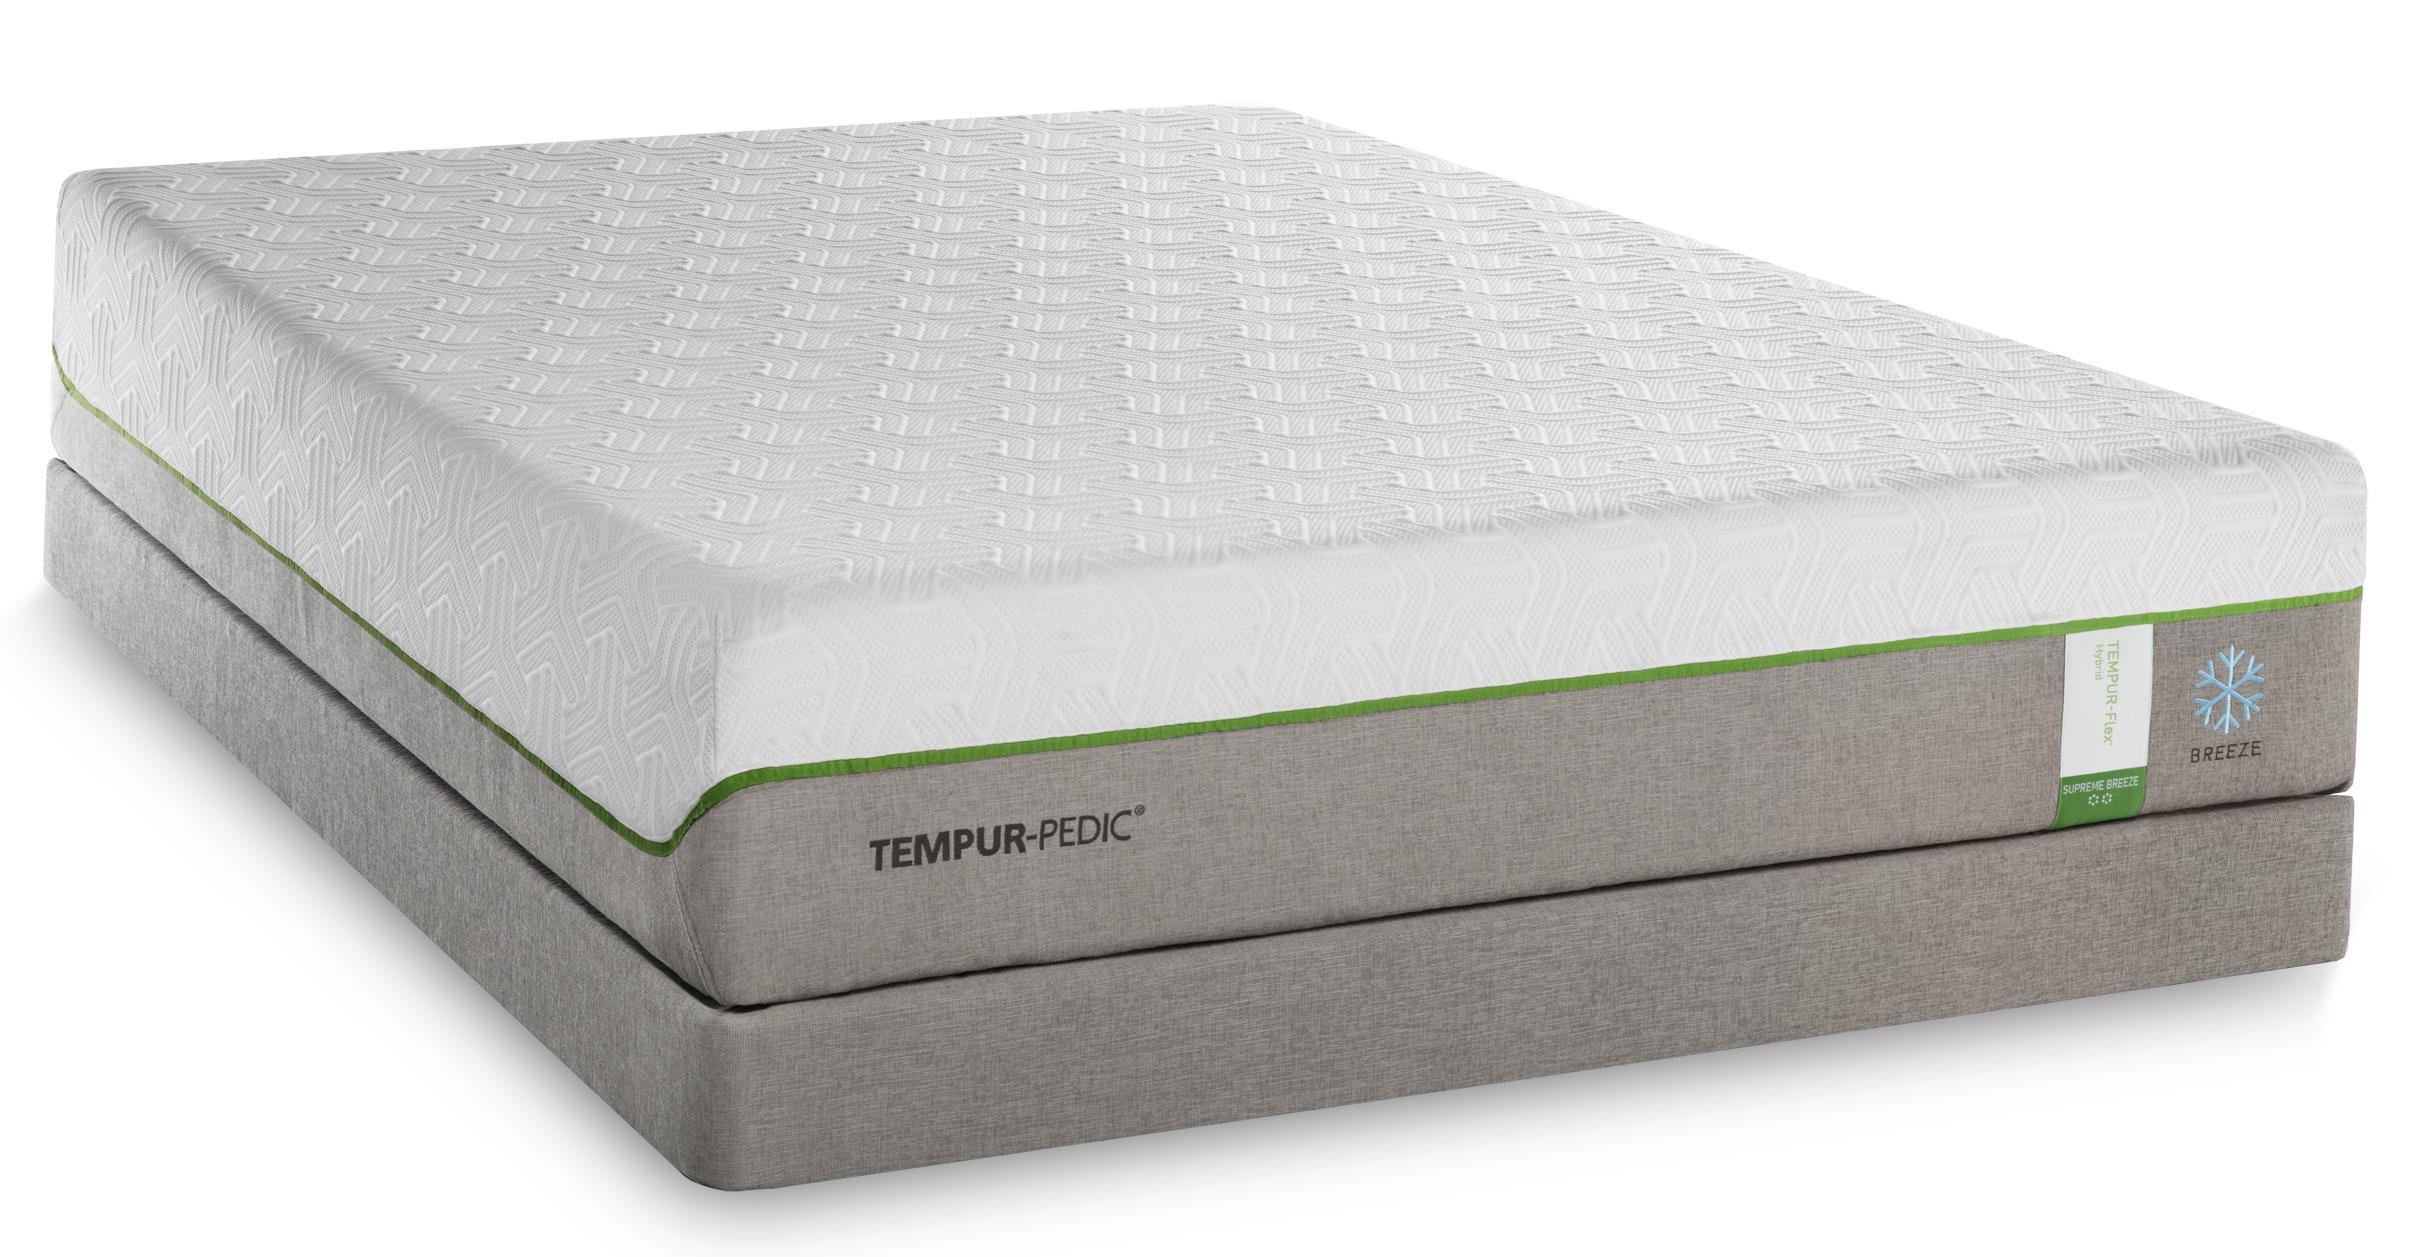 Tempur-Pedic® TEMPUR-Flex Supreme Breeze King Medium Plush Mattress Set, Adj - Item Number: 10292270+2x25287120